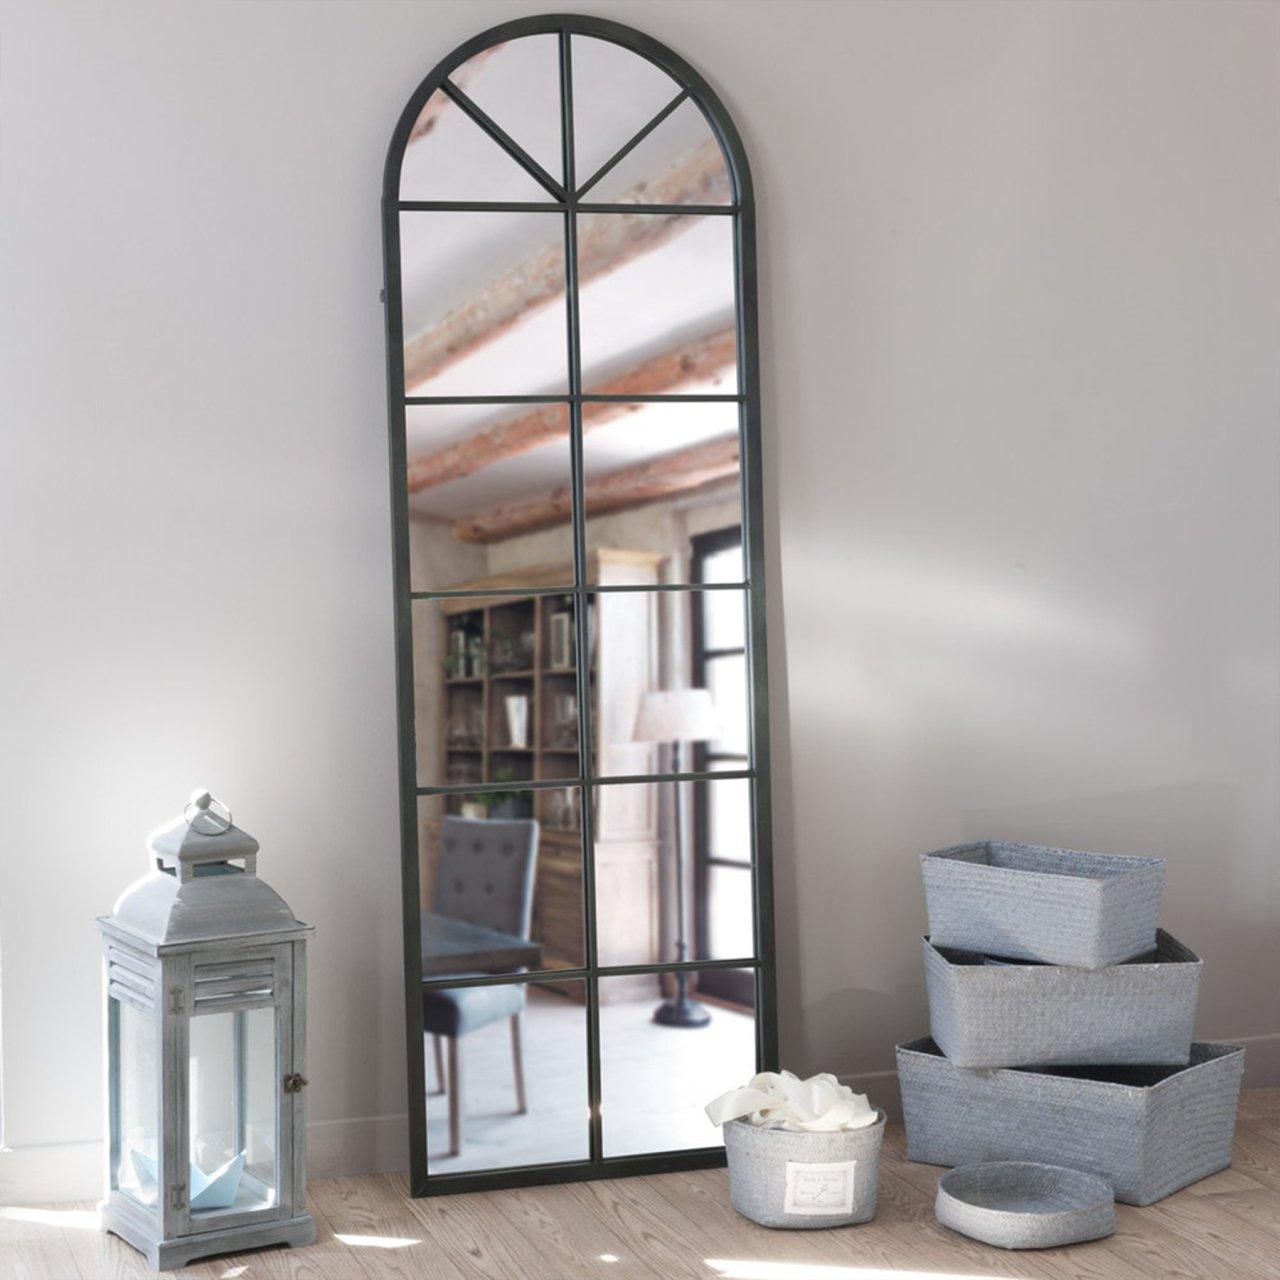 39 39 kure 39 39 metal boy aynas. Black Bedroom Furniture Sets. Home Design Ideas